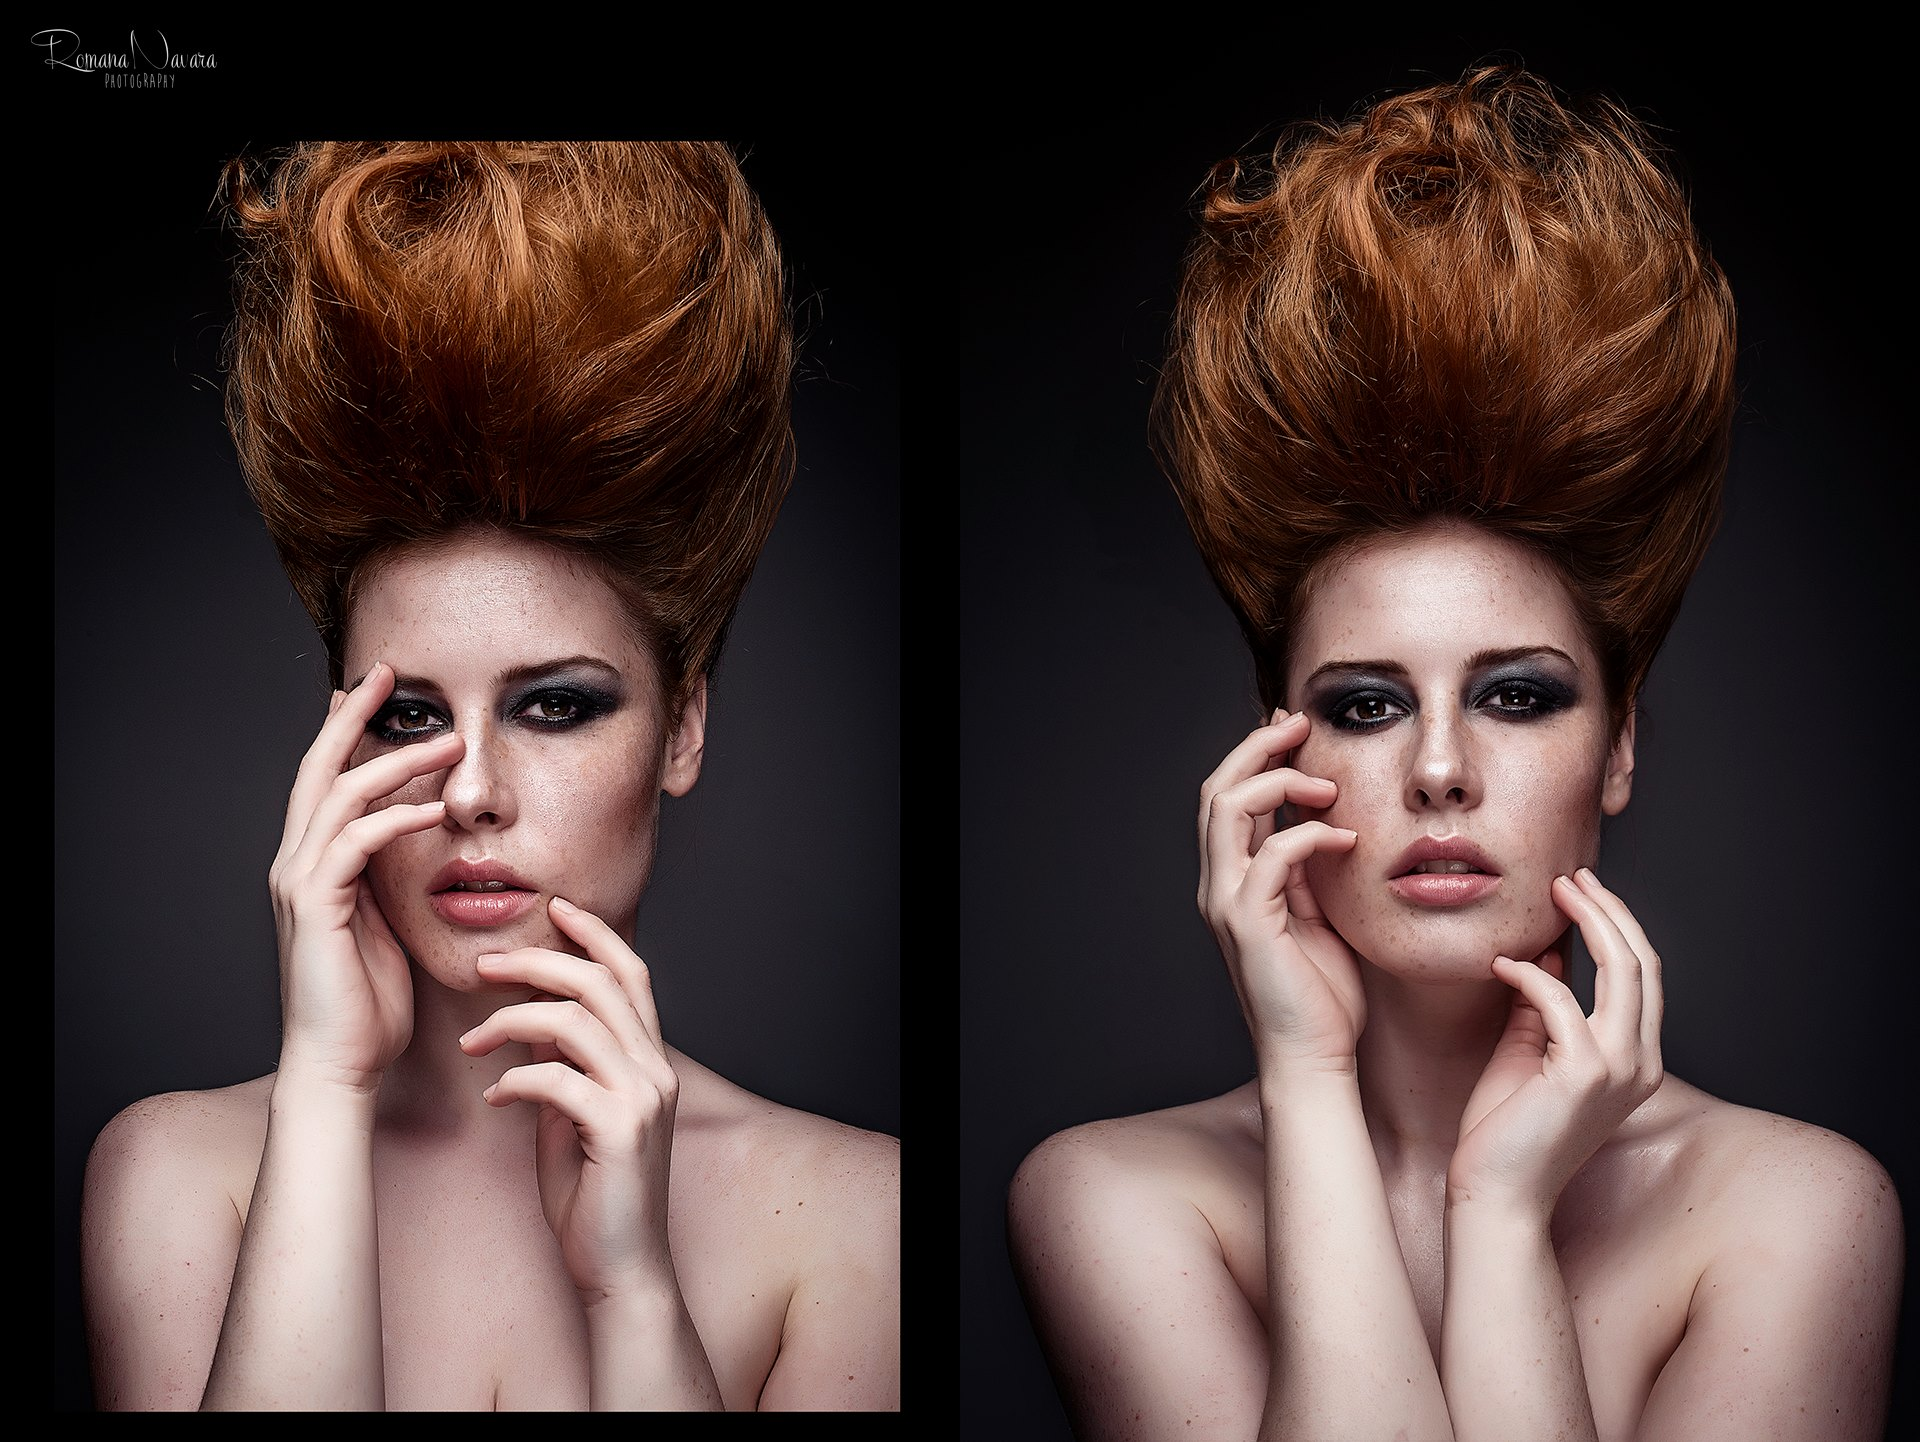 Lenka Regalová redhead freackles rock volume hair